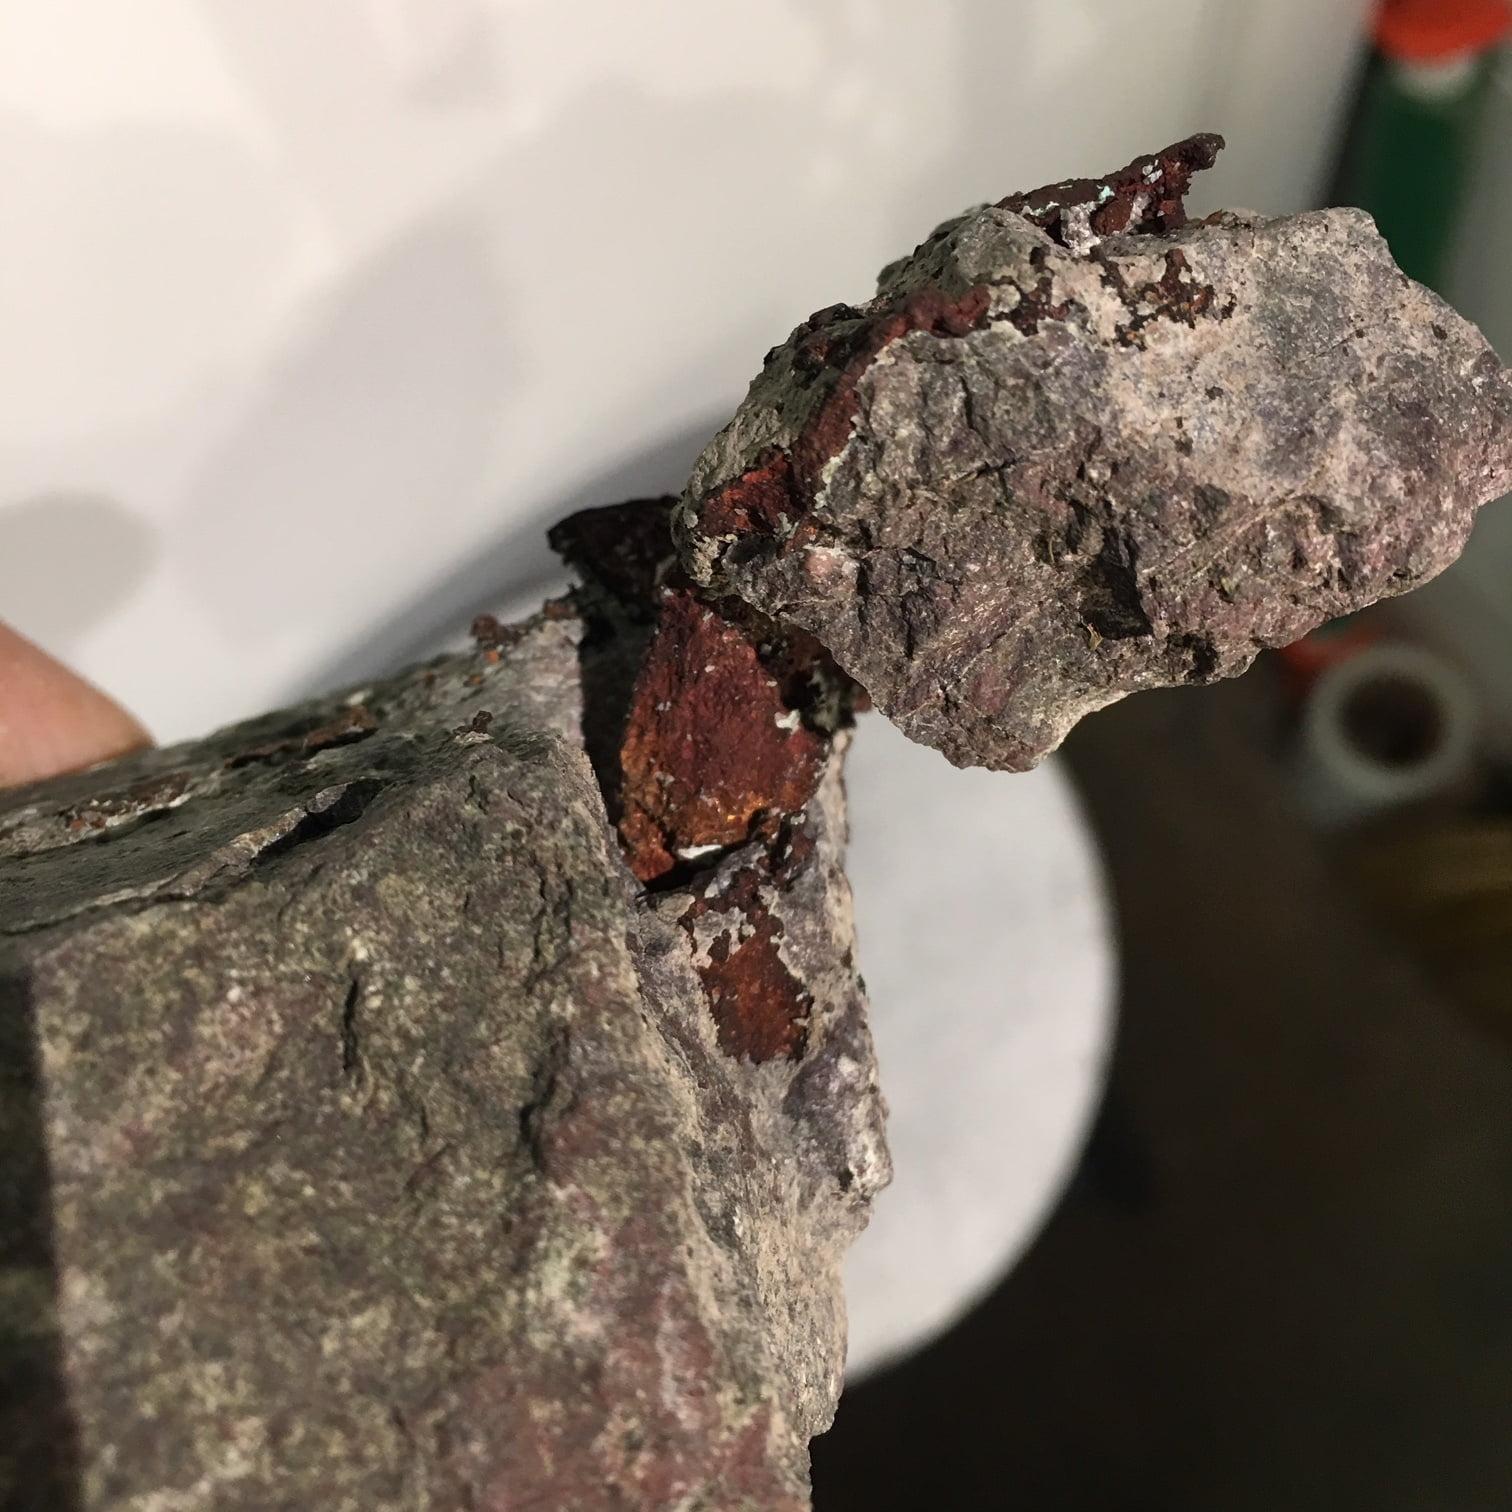 #C2 Copper Crystal Spearing Thru Two Pieces of Matrix, Michigan Upper Peninsula